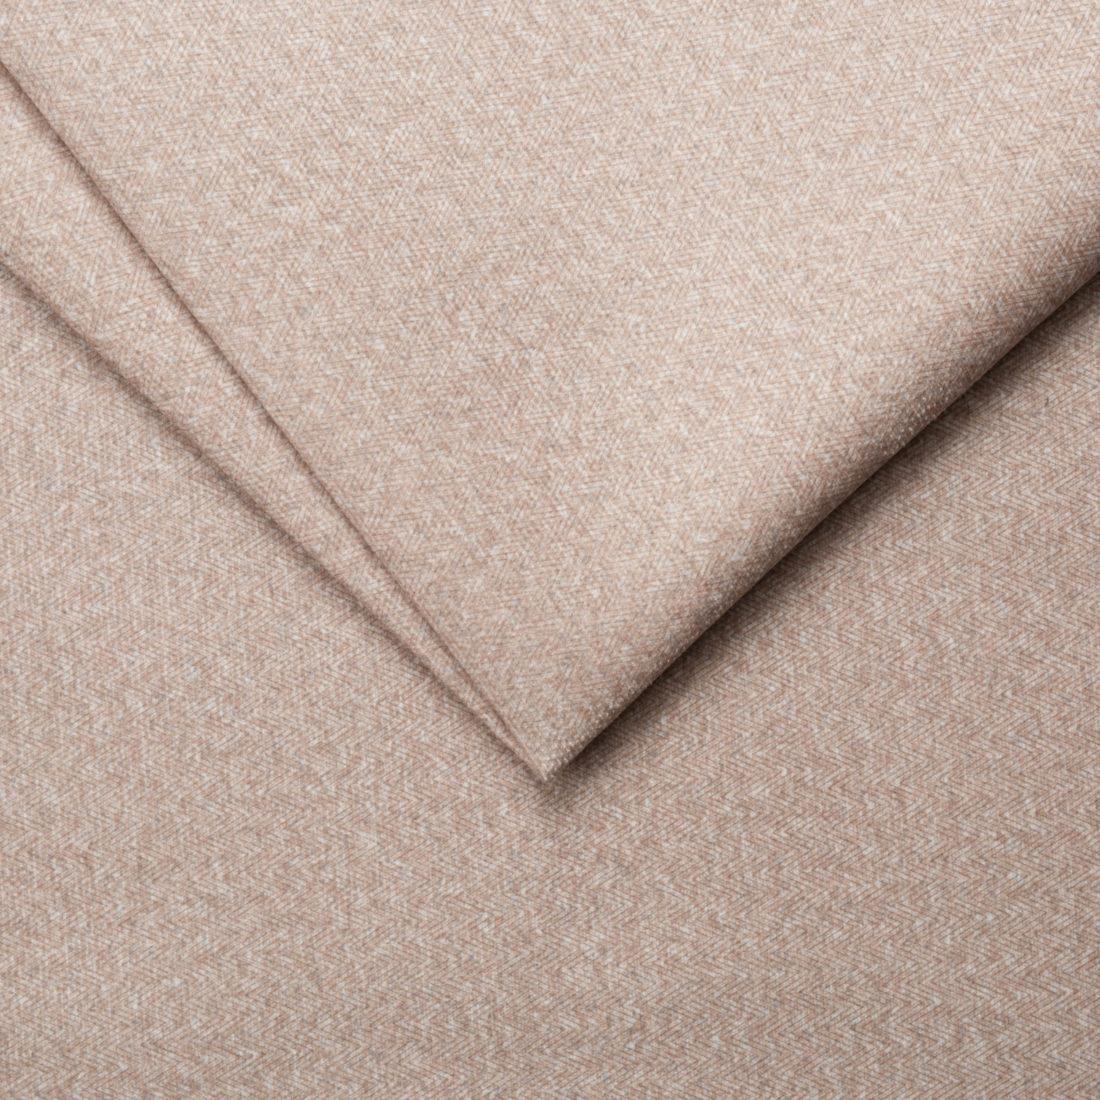 Меблева тканина Next 1 Natural, велюр